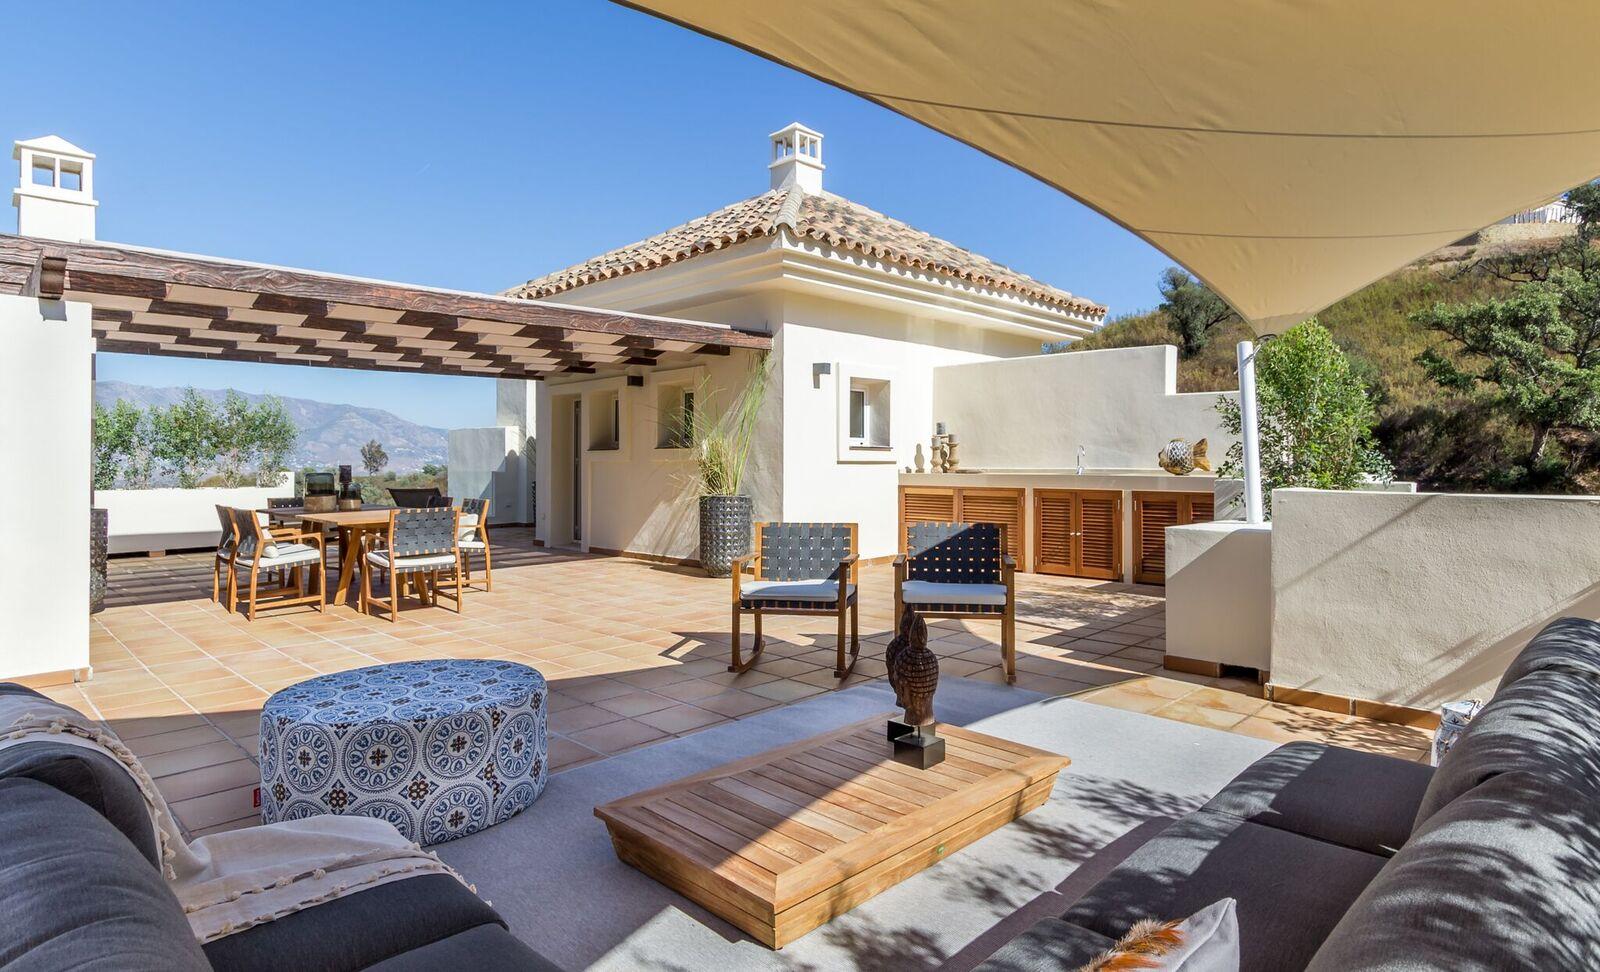 La-Mairena-Terrace-Exterior-2